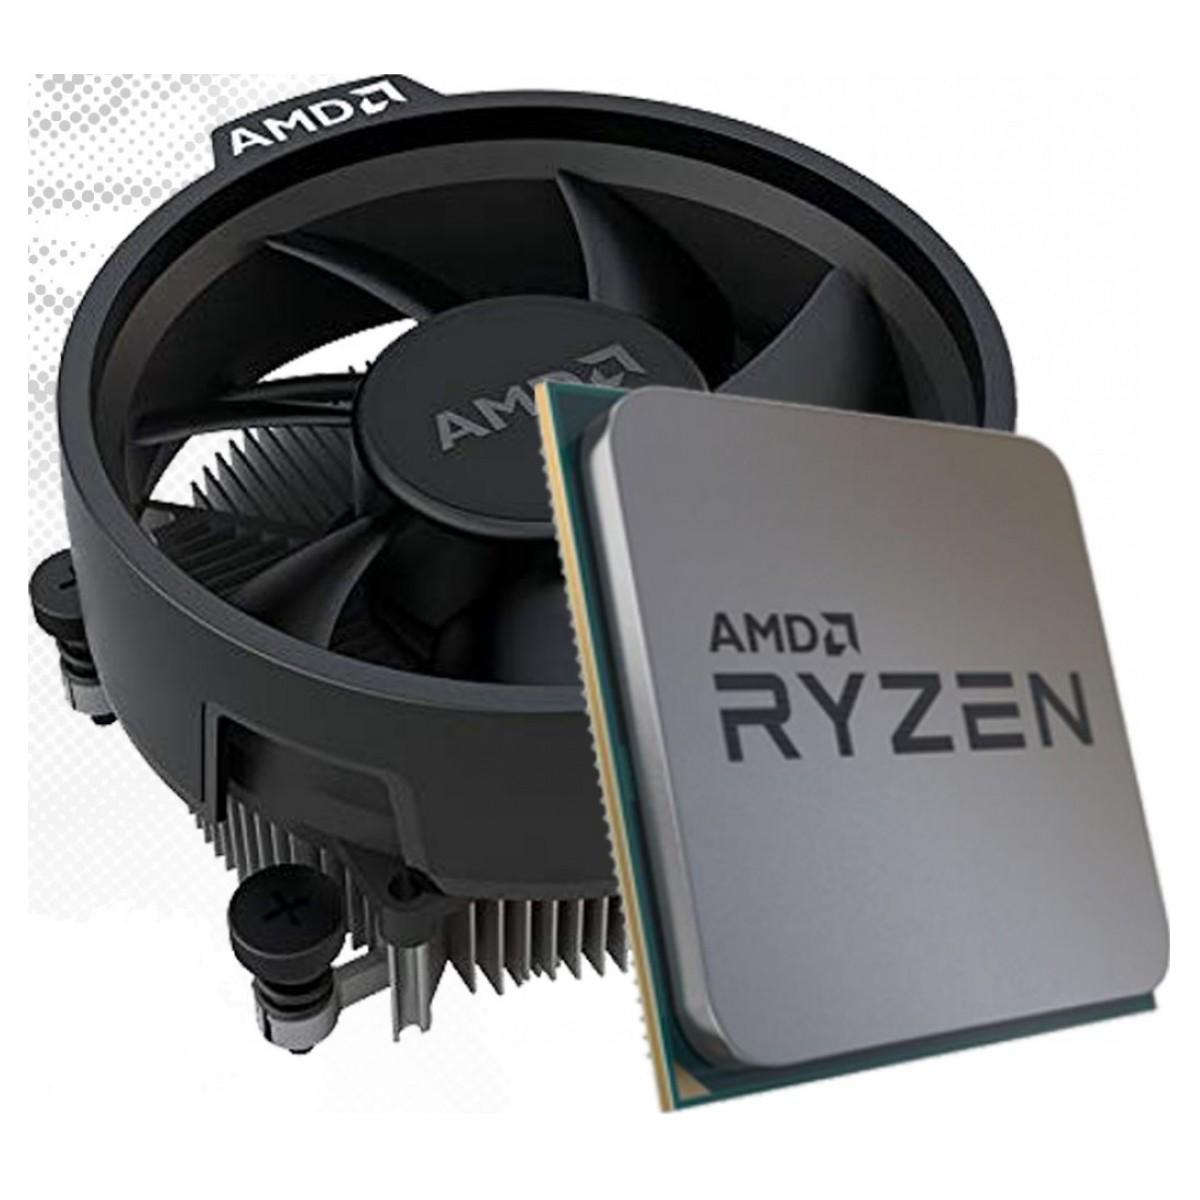 Processador AMD Ryzen 5 3600 3.6GHz (4.2GHz Turbo), 6-Cores 12-Threads, Cooler Wraith Stealth, AM4, 100-10000031MPK, S/ Video